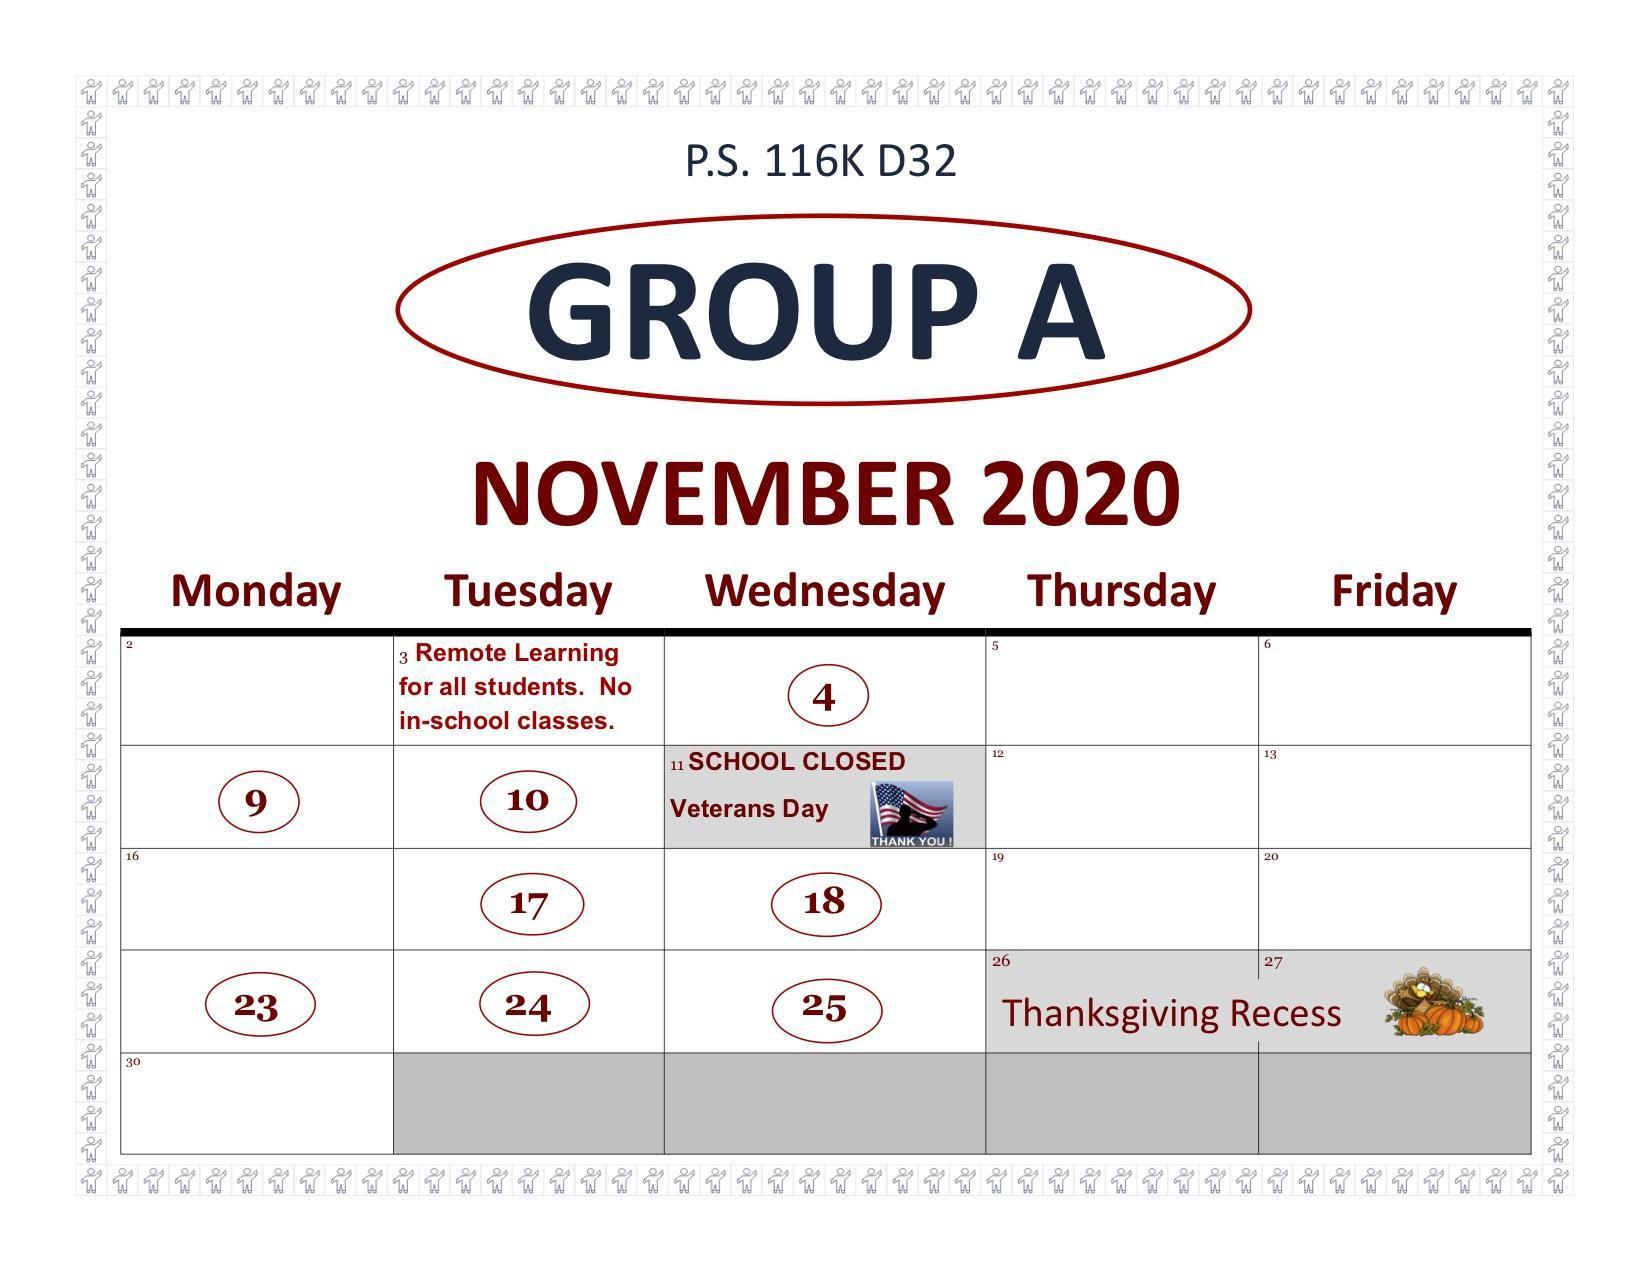 Group A November